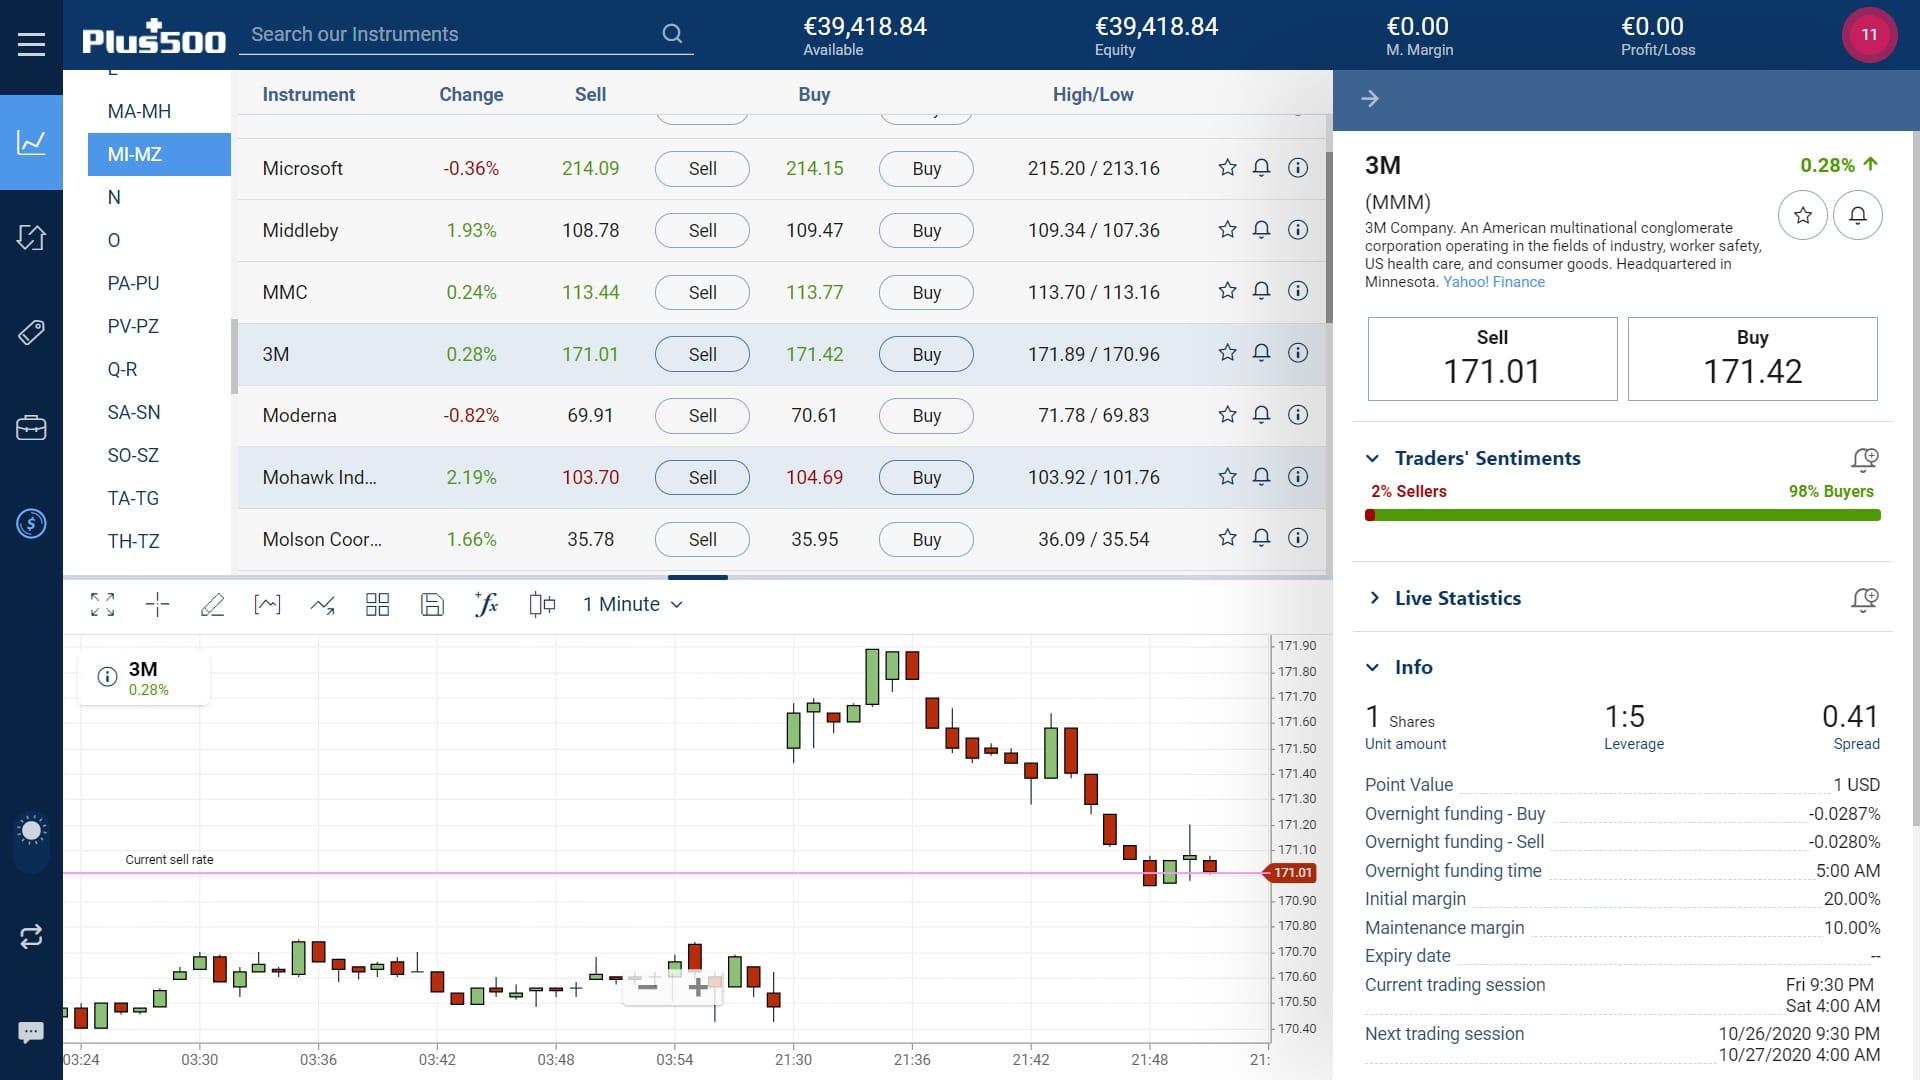 3M stock trading on Plus500's WebTrader platform